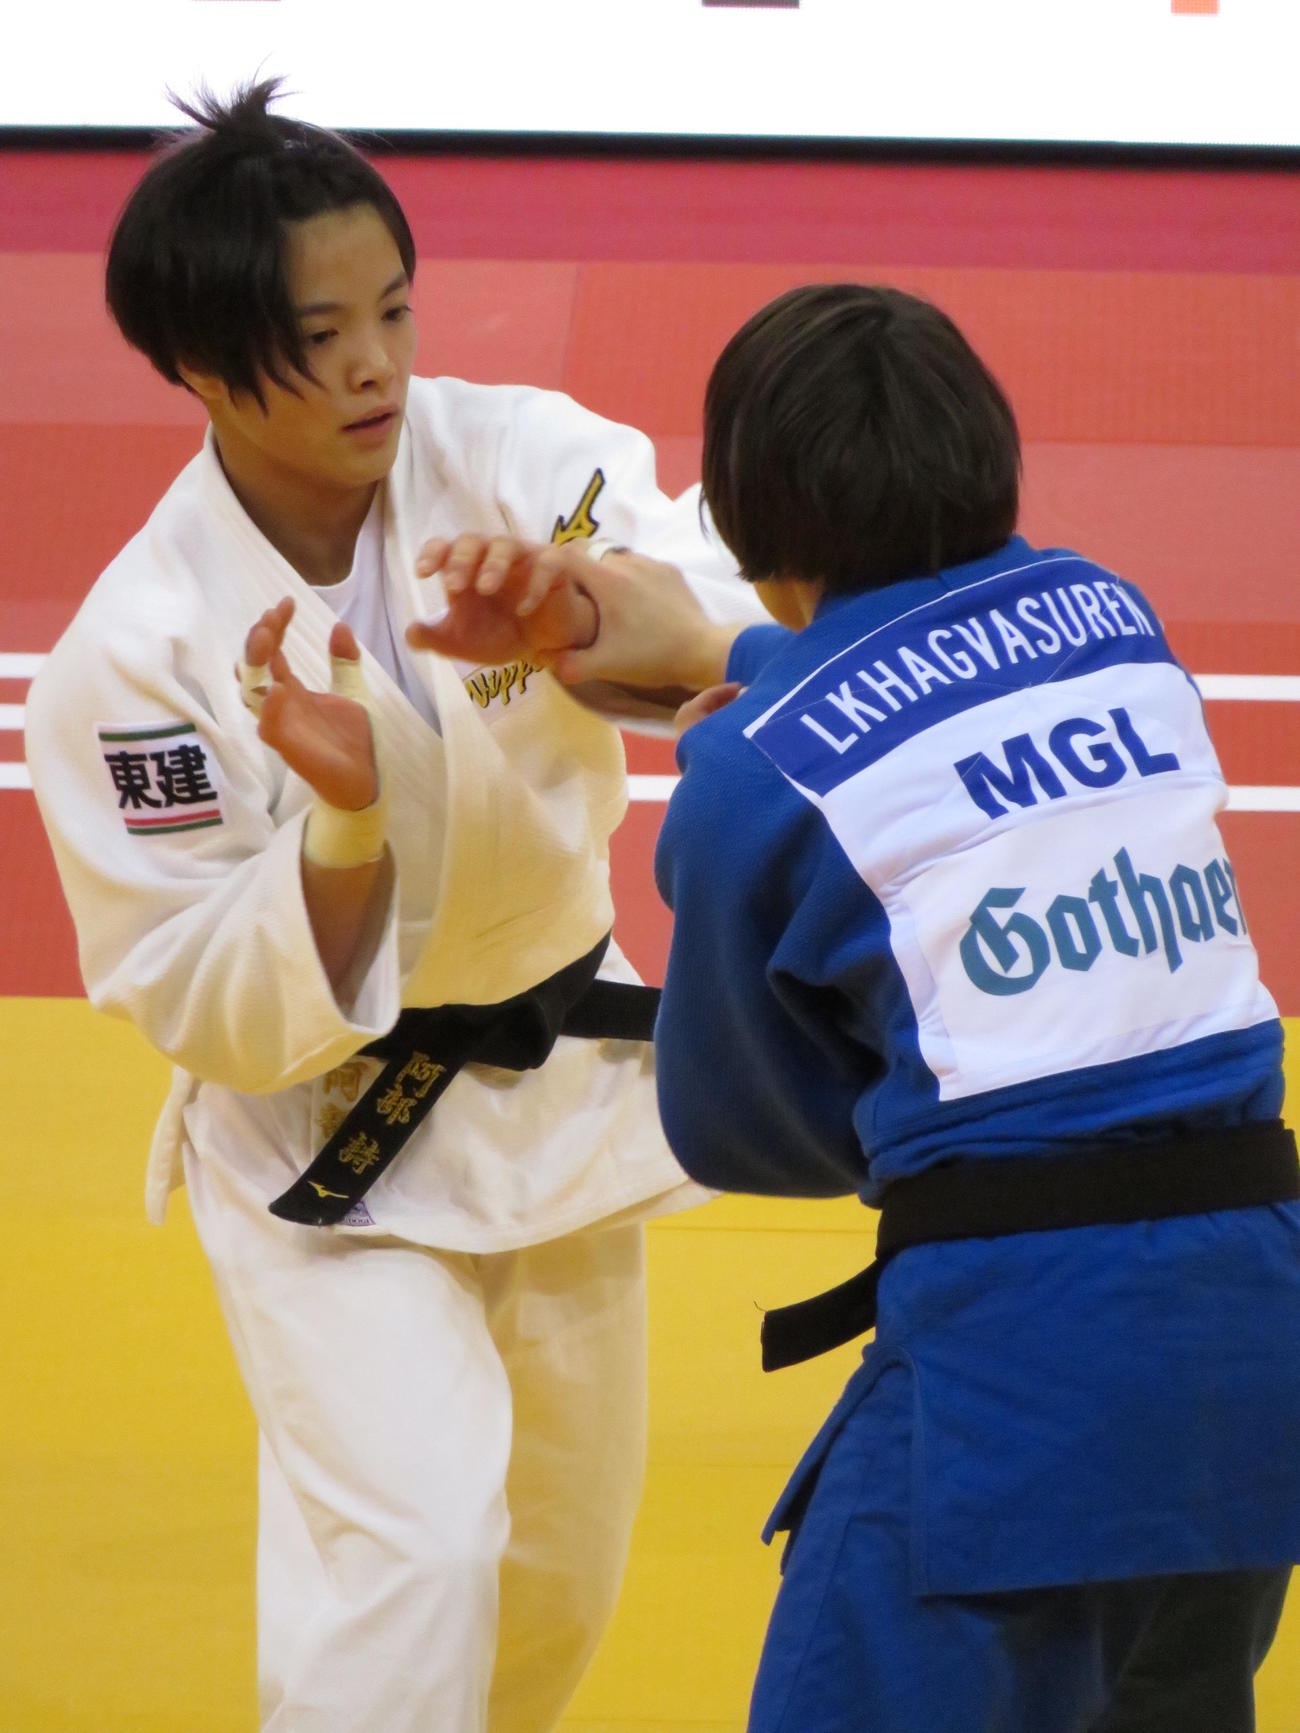 GSデュッセルドルフ大会準々決勝でモンゴル選手と対戦する阿部詩(撮影・峯岸佑樹)